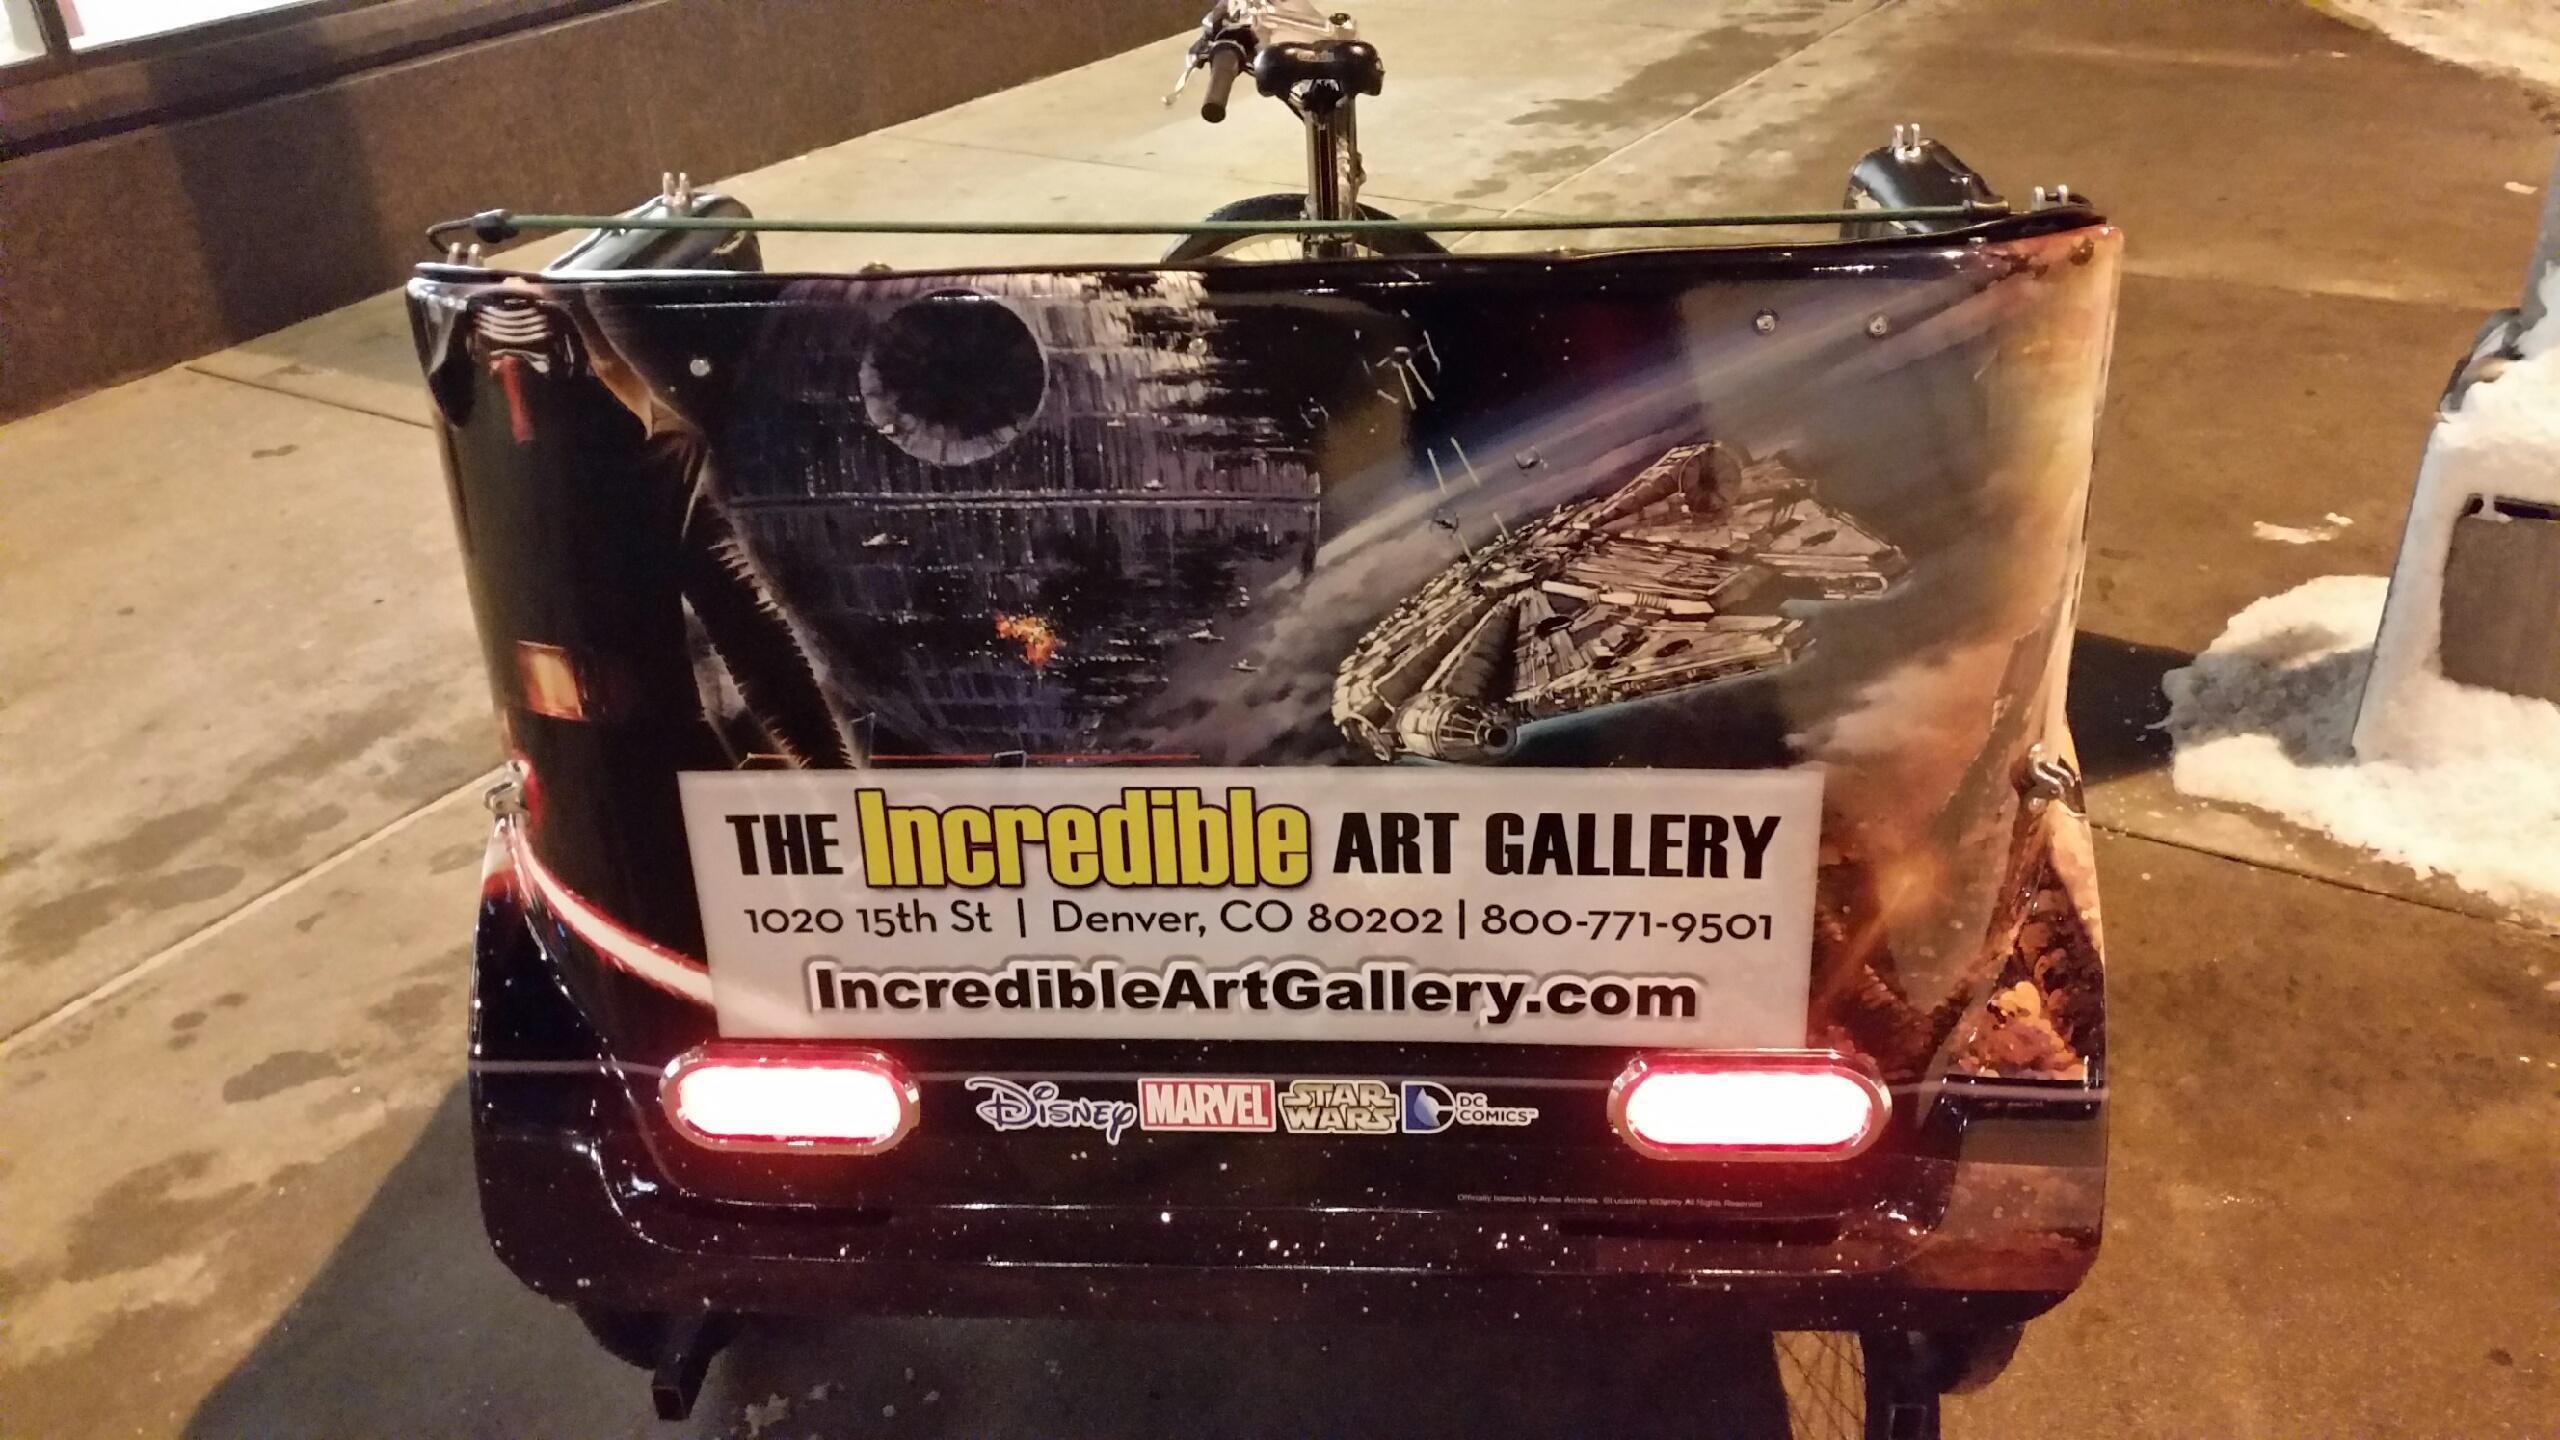 The Incredible Art Gallery Pedi-Cab Design by Seen Designspedicab2